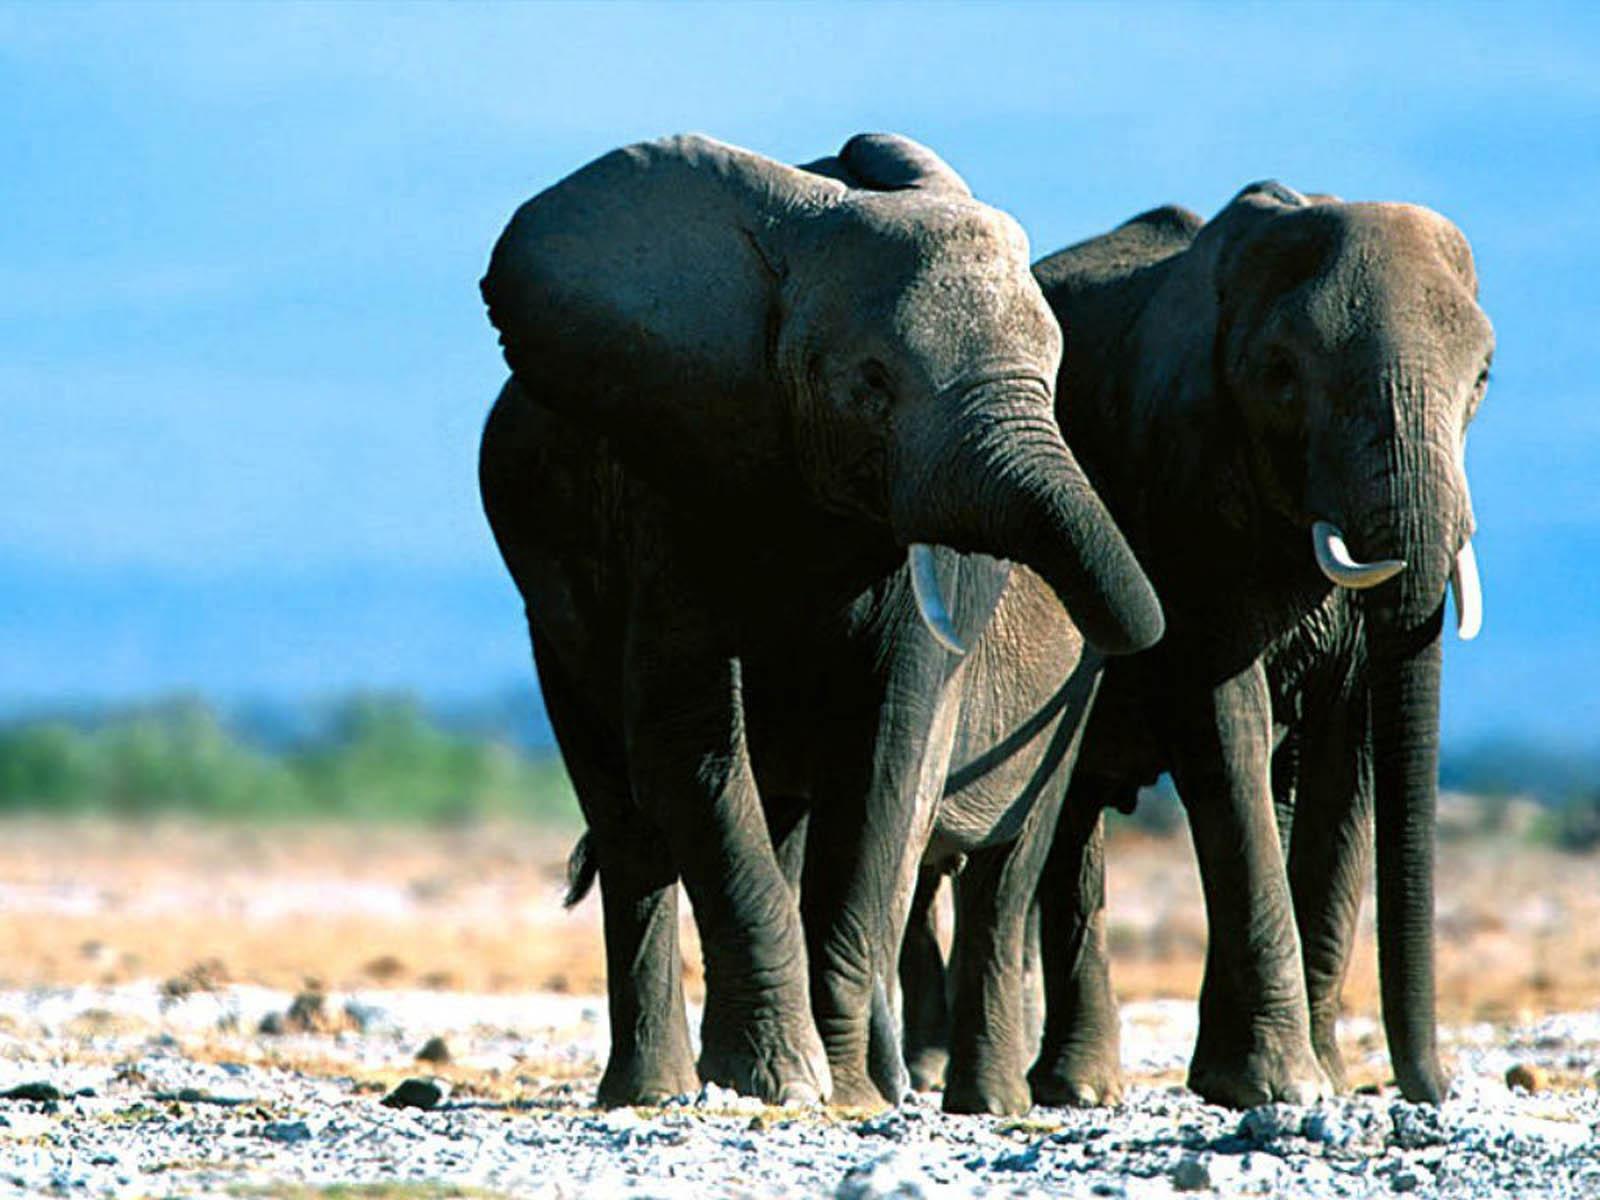 elephants wallpapers world - photo #30